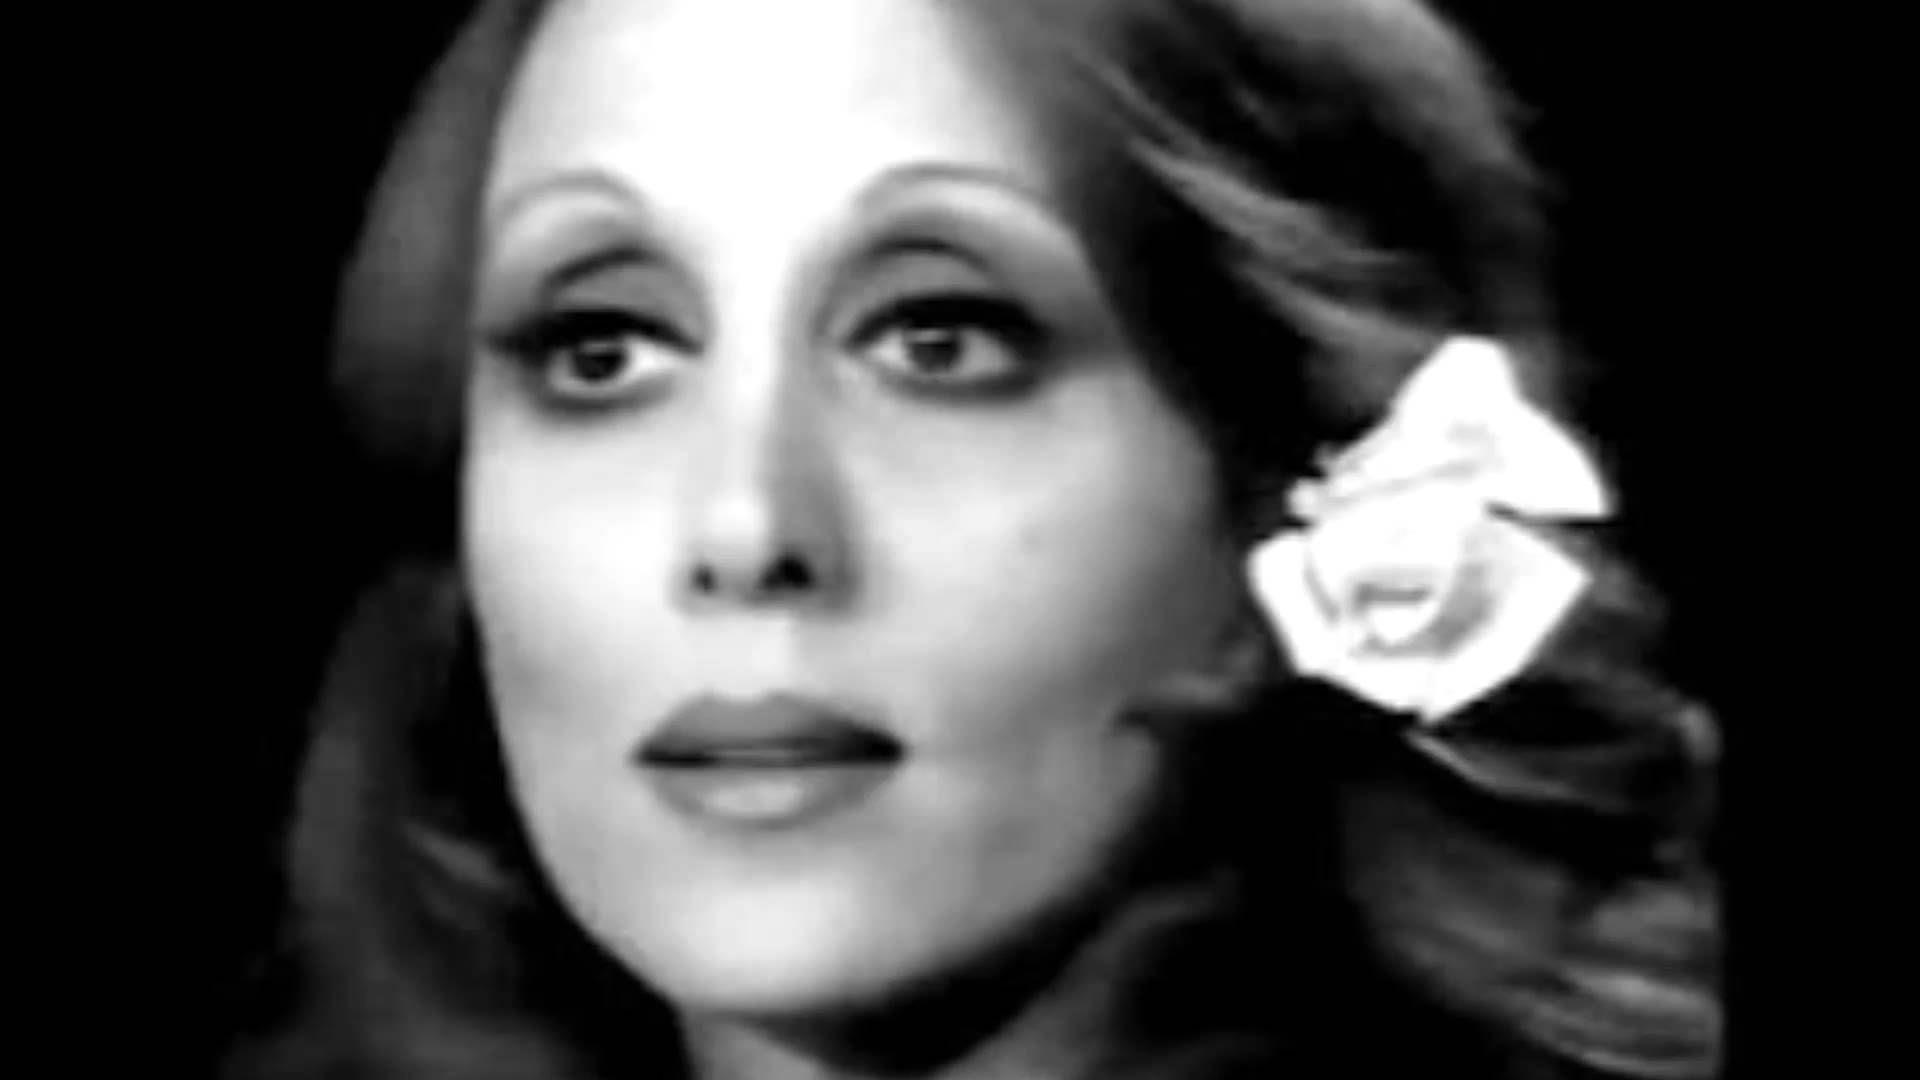 Fairouz Songs within music of best of fairouz (lebanese singer) موسيقى هادئة - أغاني